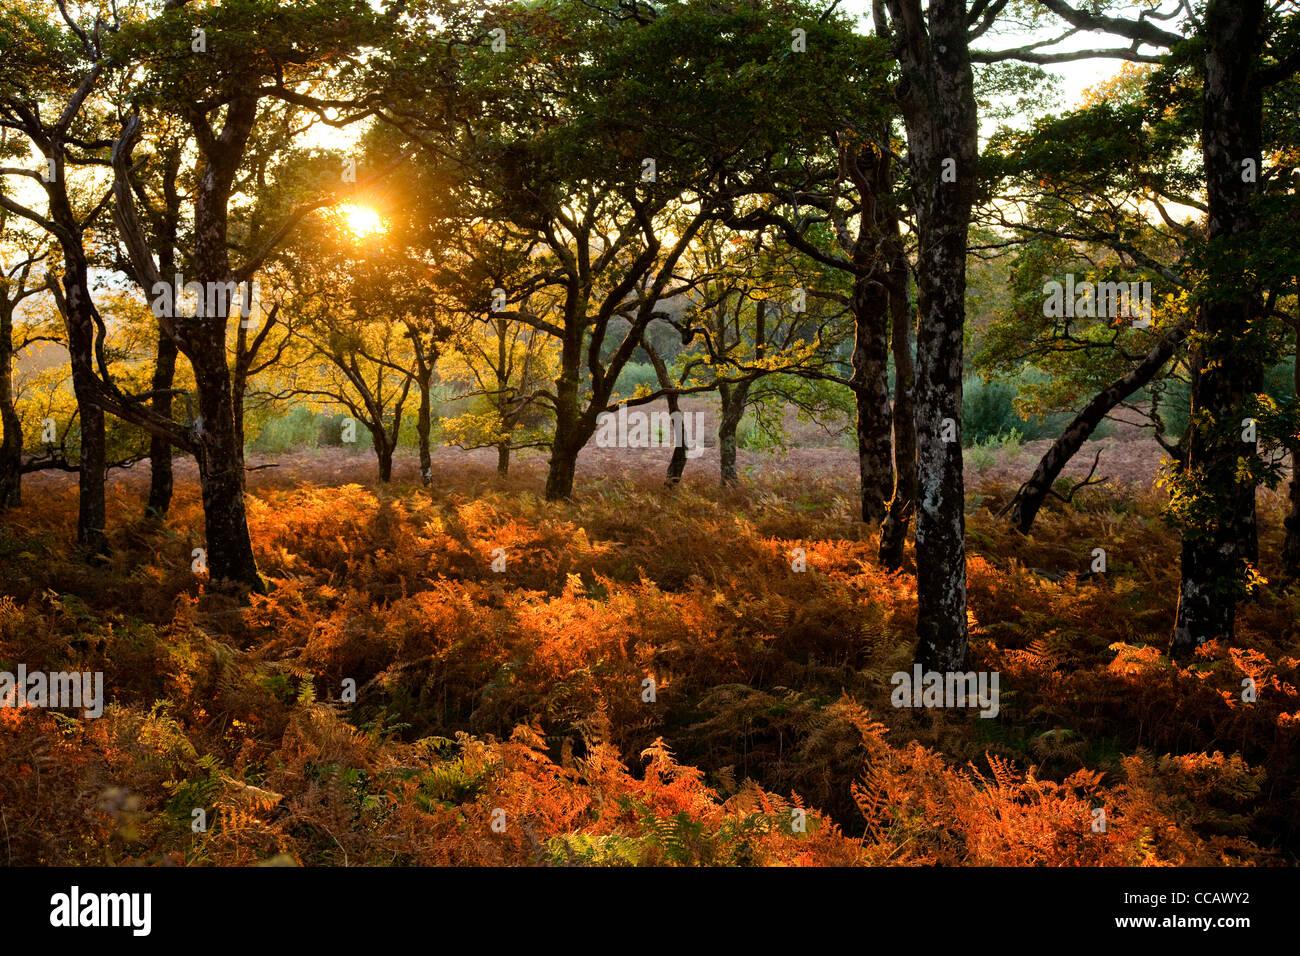 Abendlicht auf Herbst Eichenholz, Erriff Woods, County Mayo, Irland. Stockbild